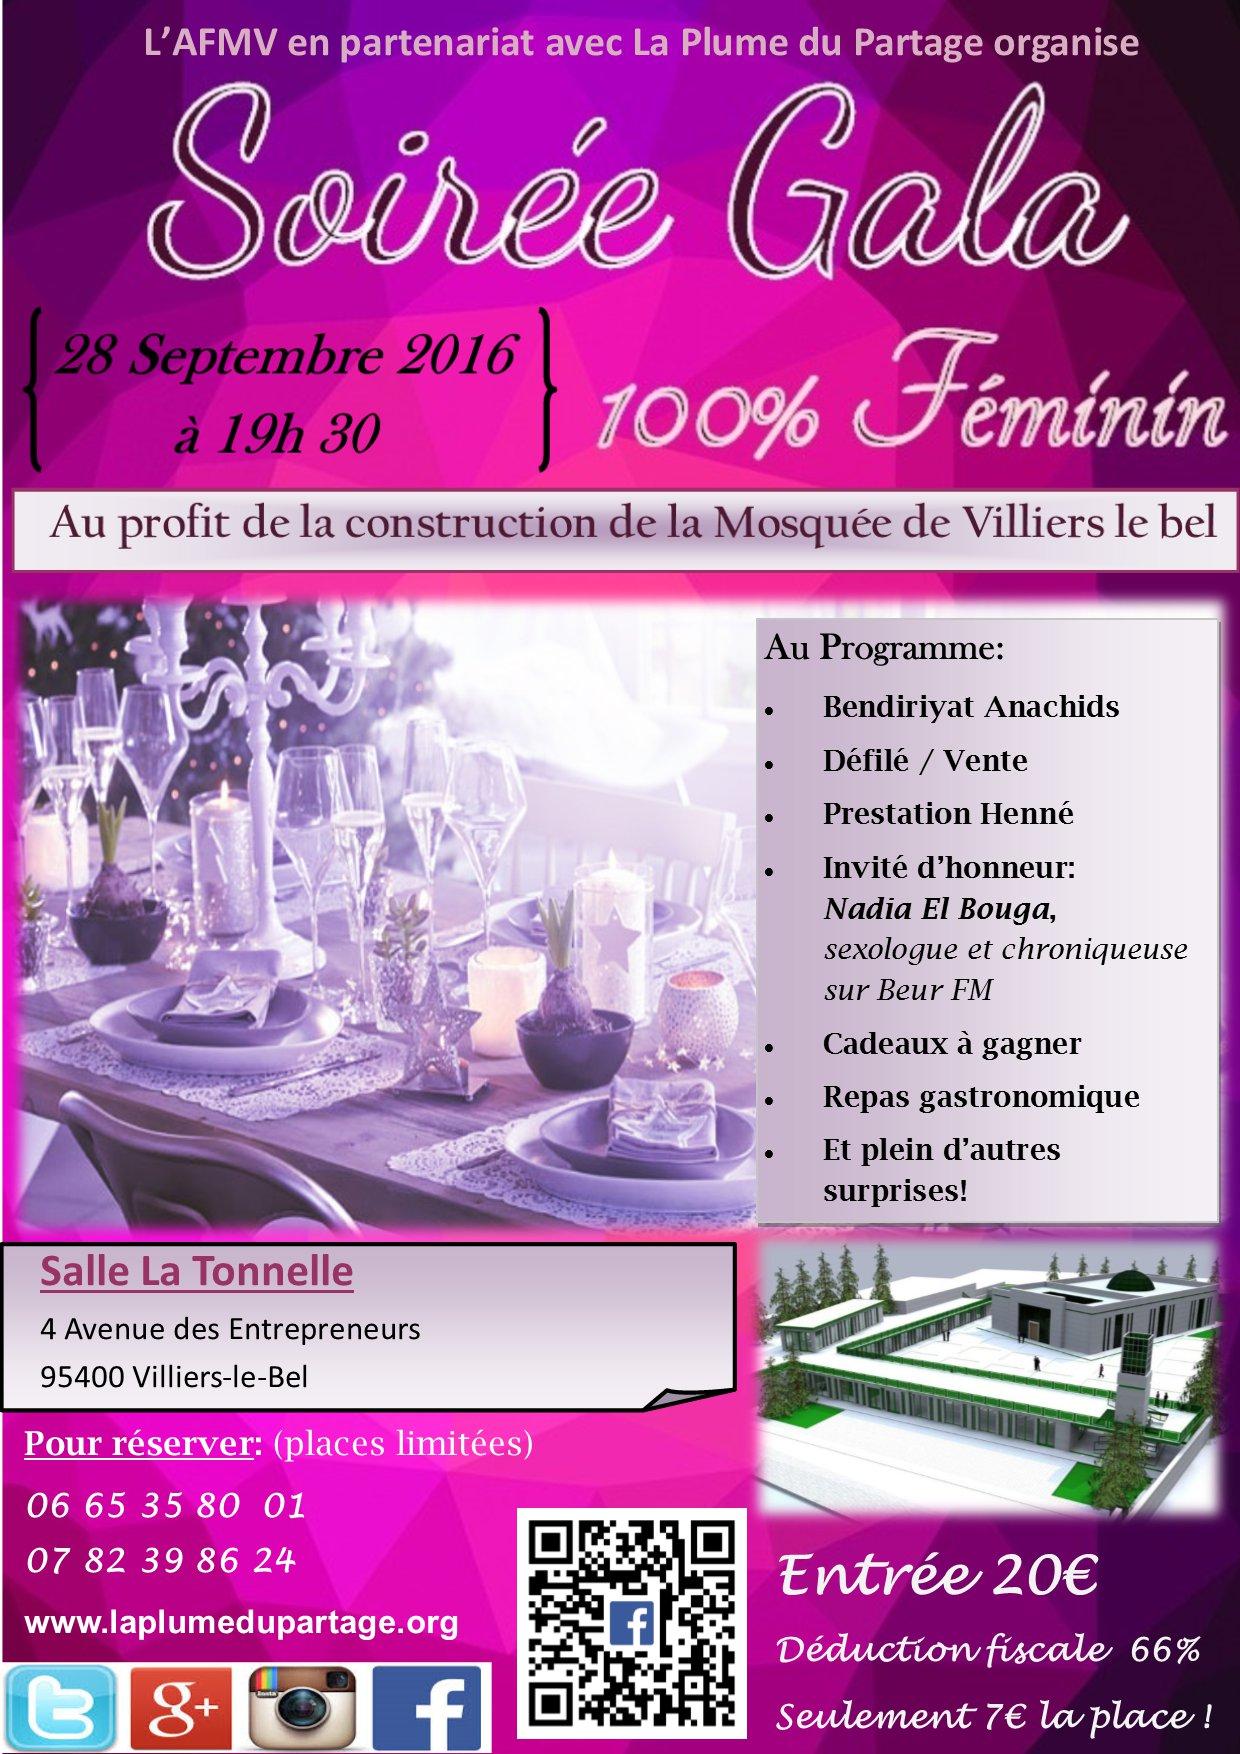 http://www.saphirnews.com/agenda/Soiree-de-gala-100-feminin_ae408799.html